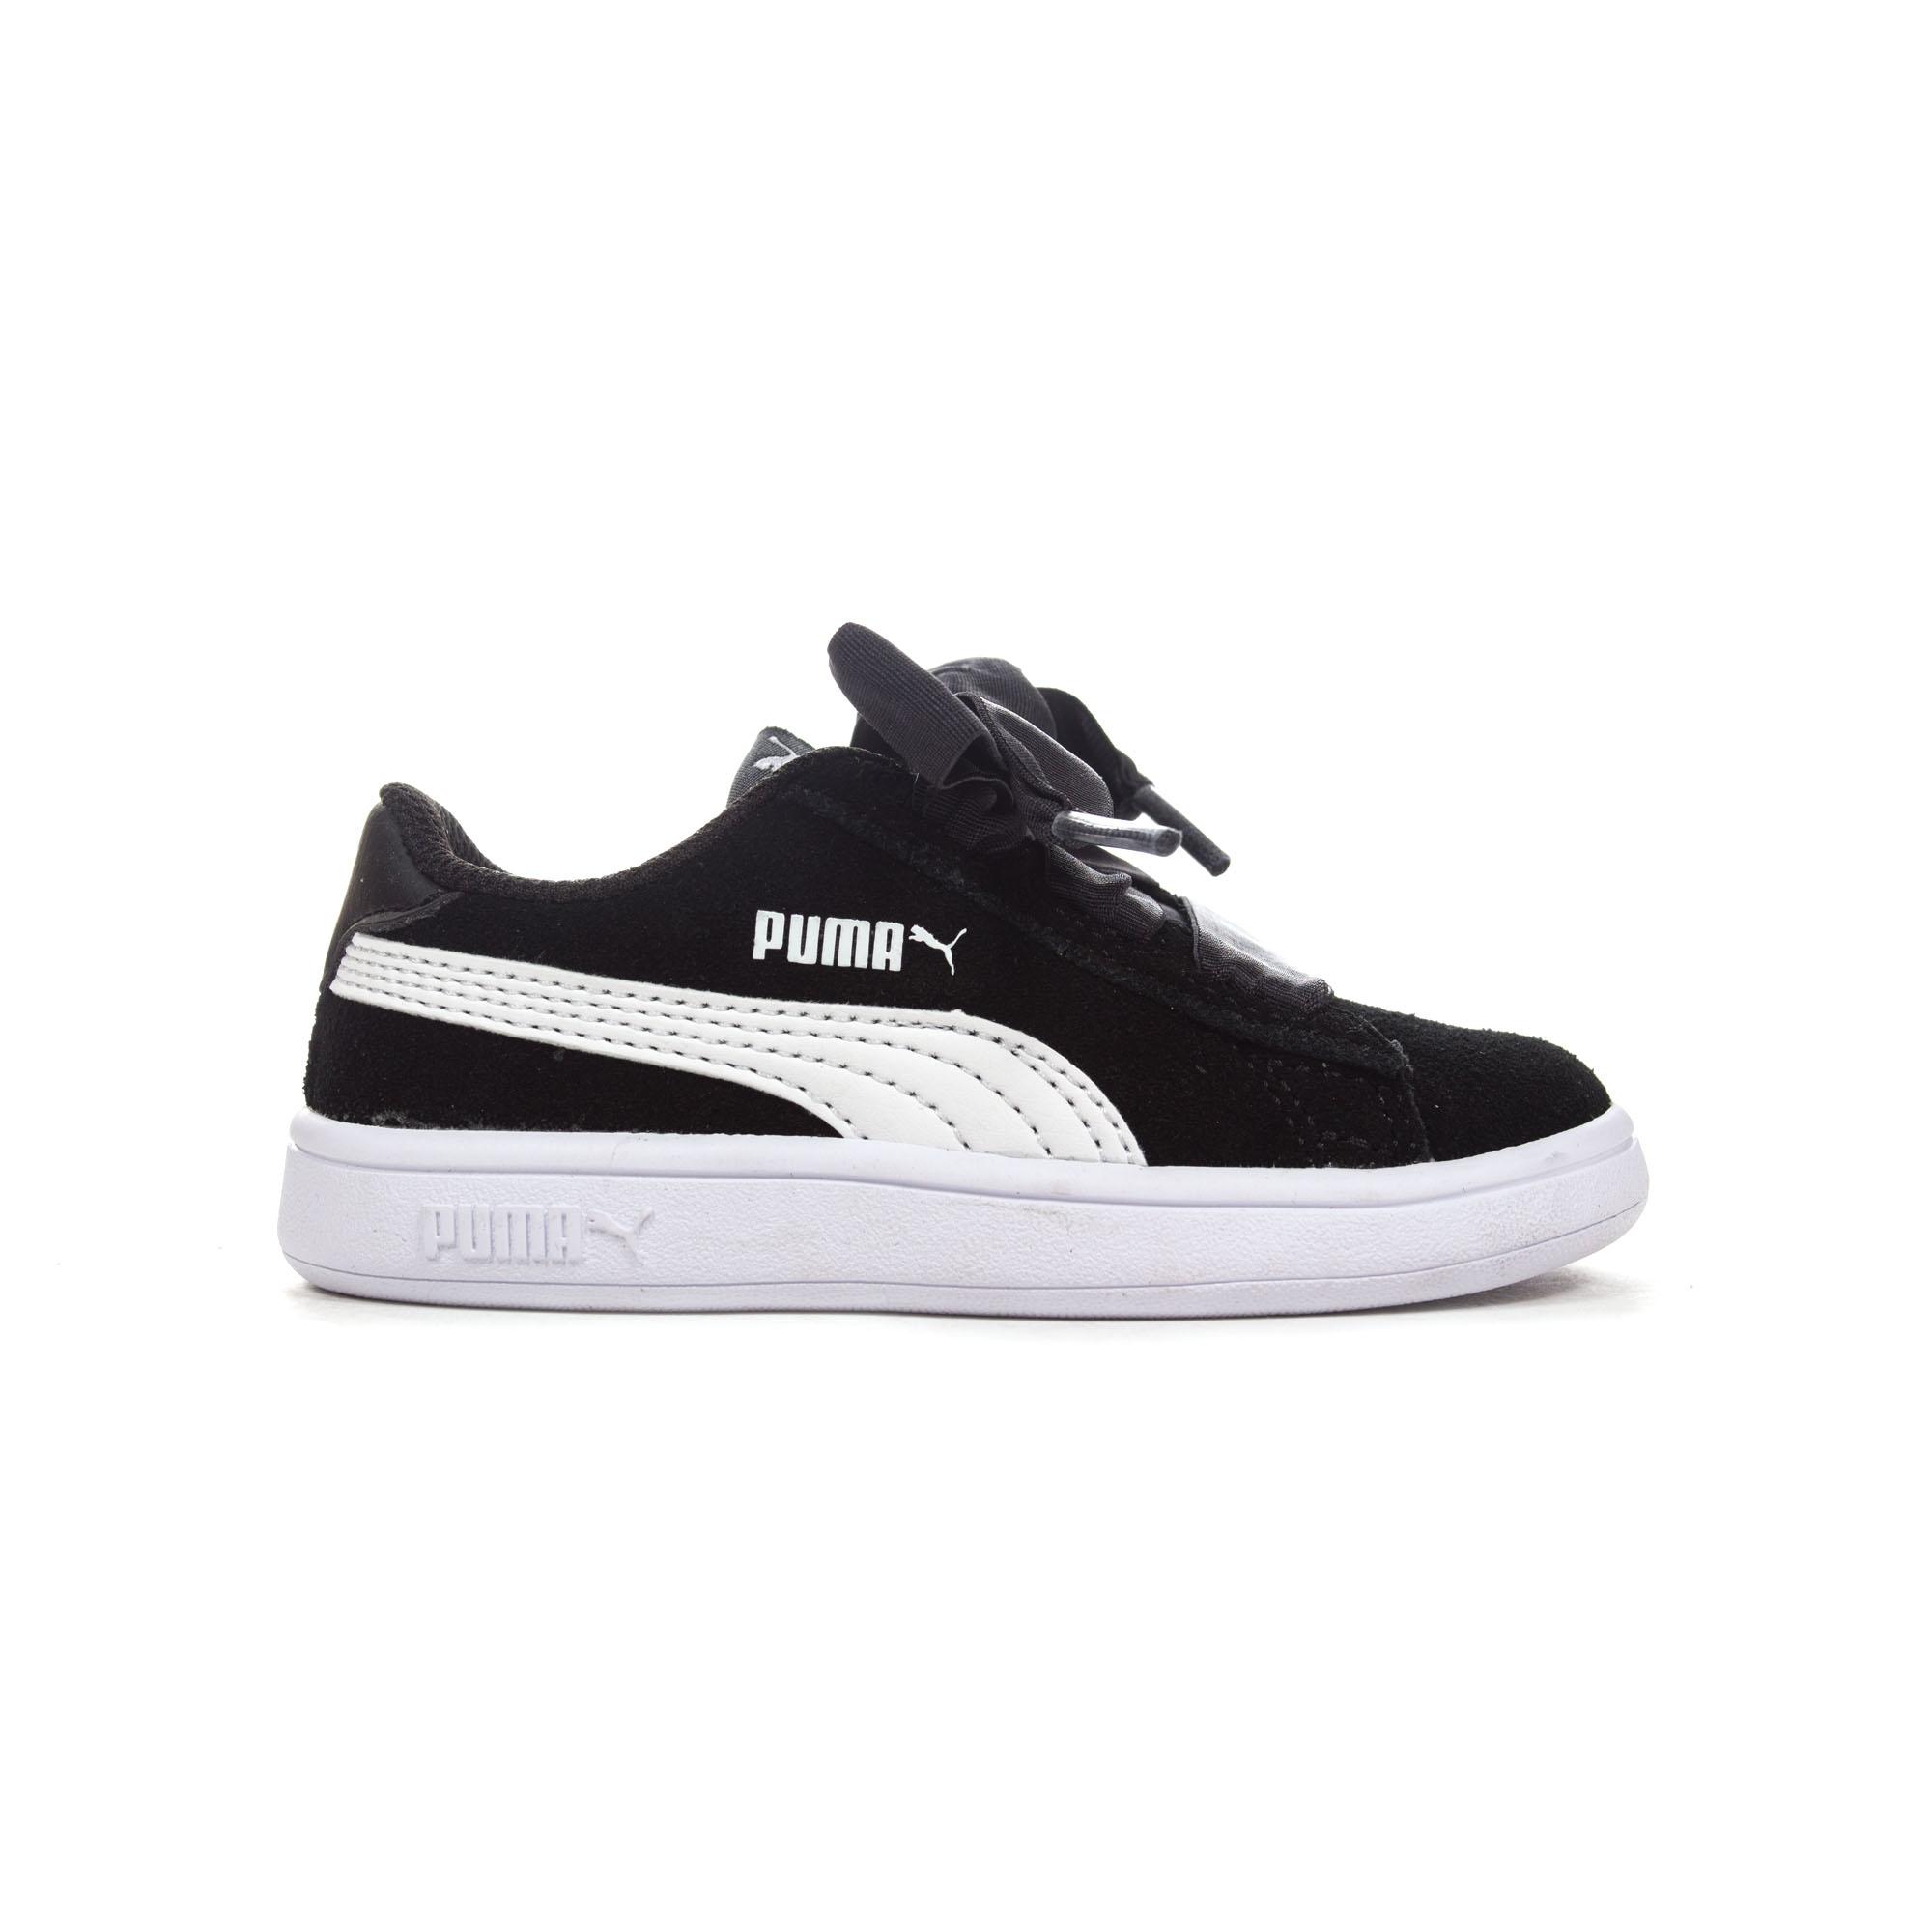 3c4db3a8ee50 Details about Puma Smash V2 Ribbon Suede Infant Girls Trainer Shoe Black  White